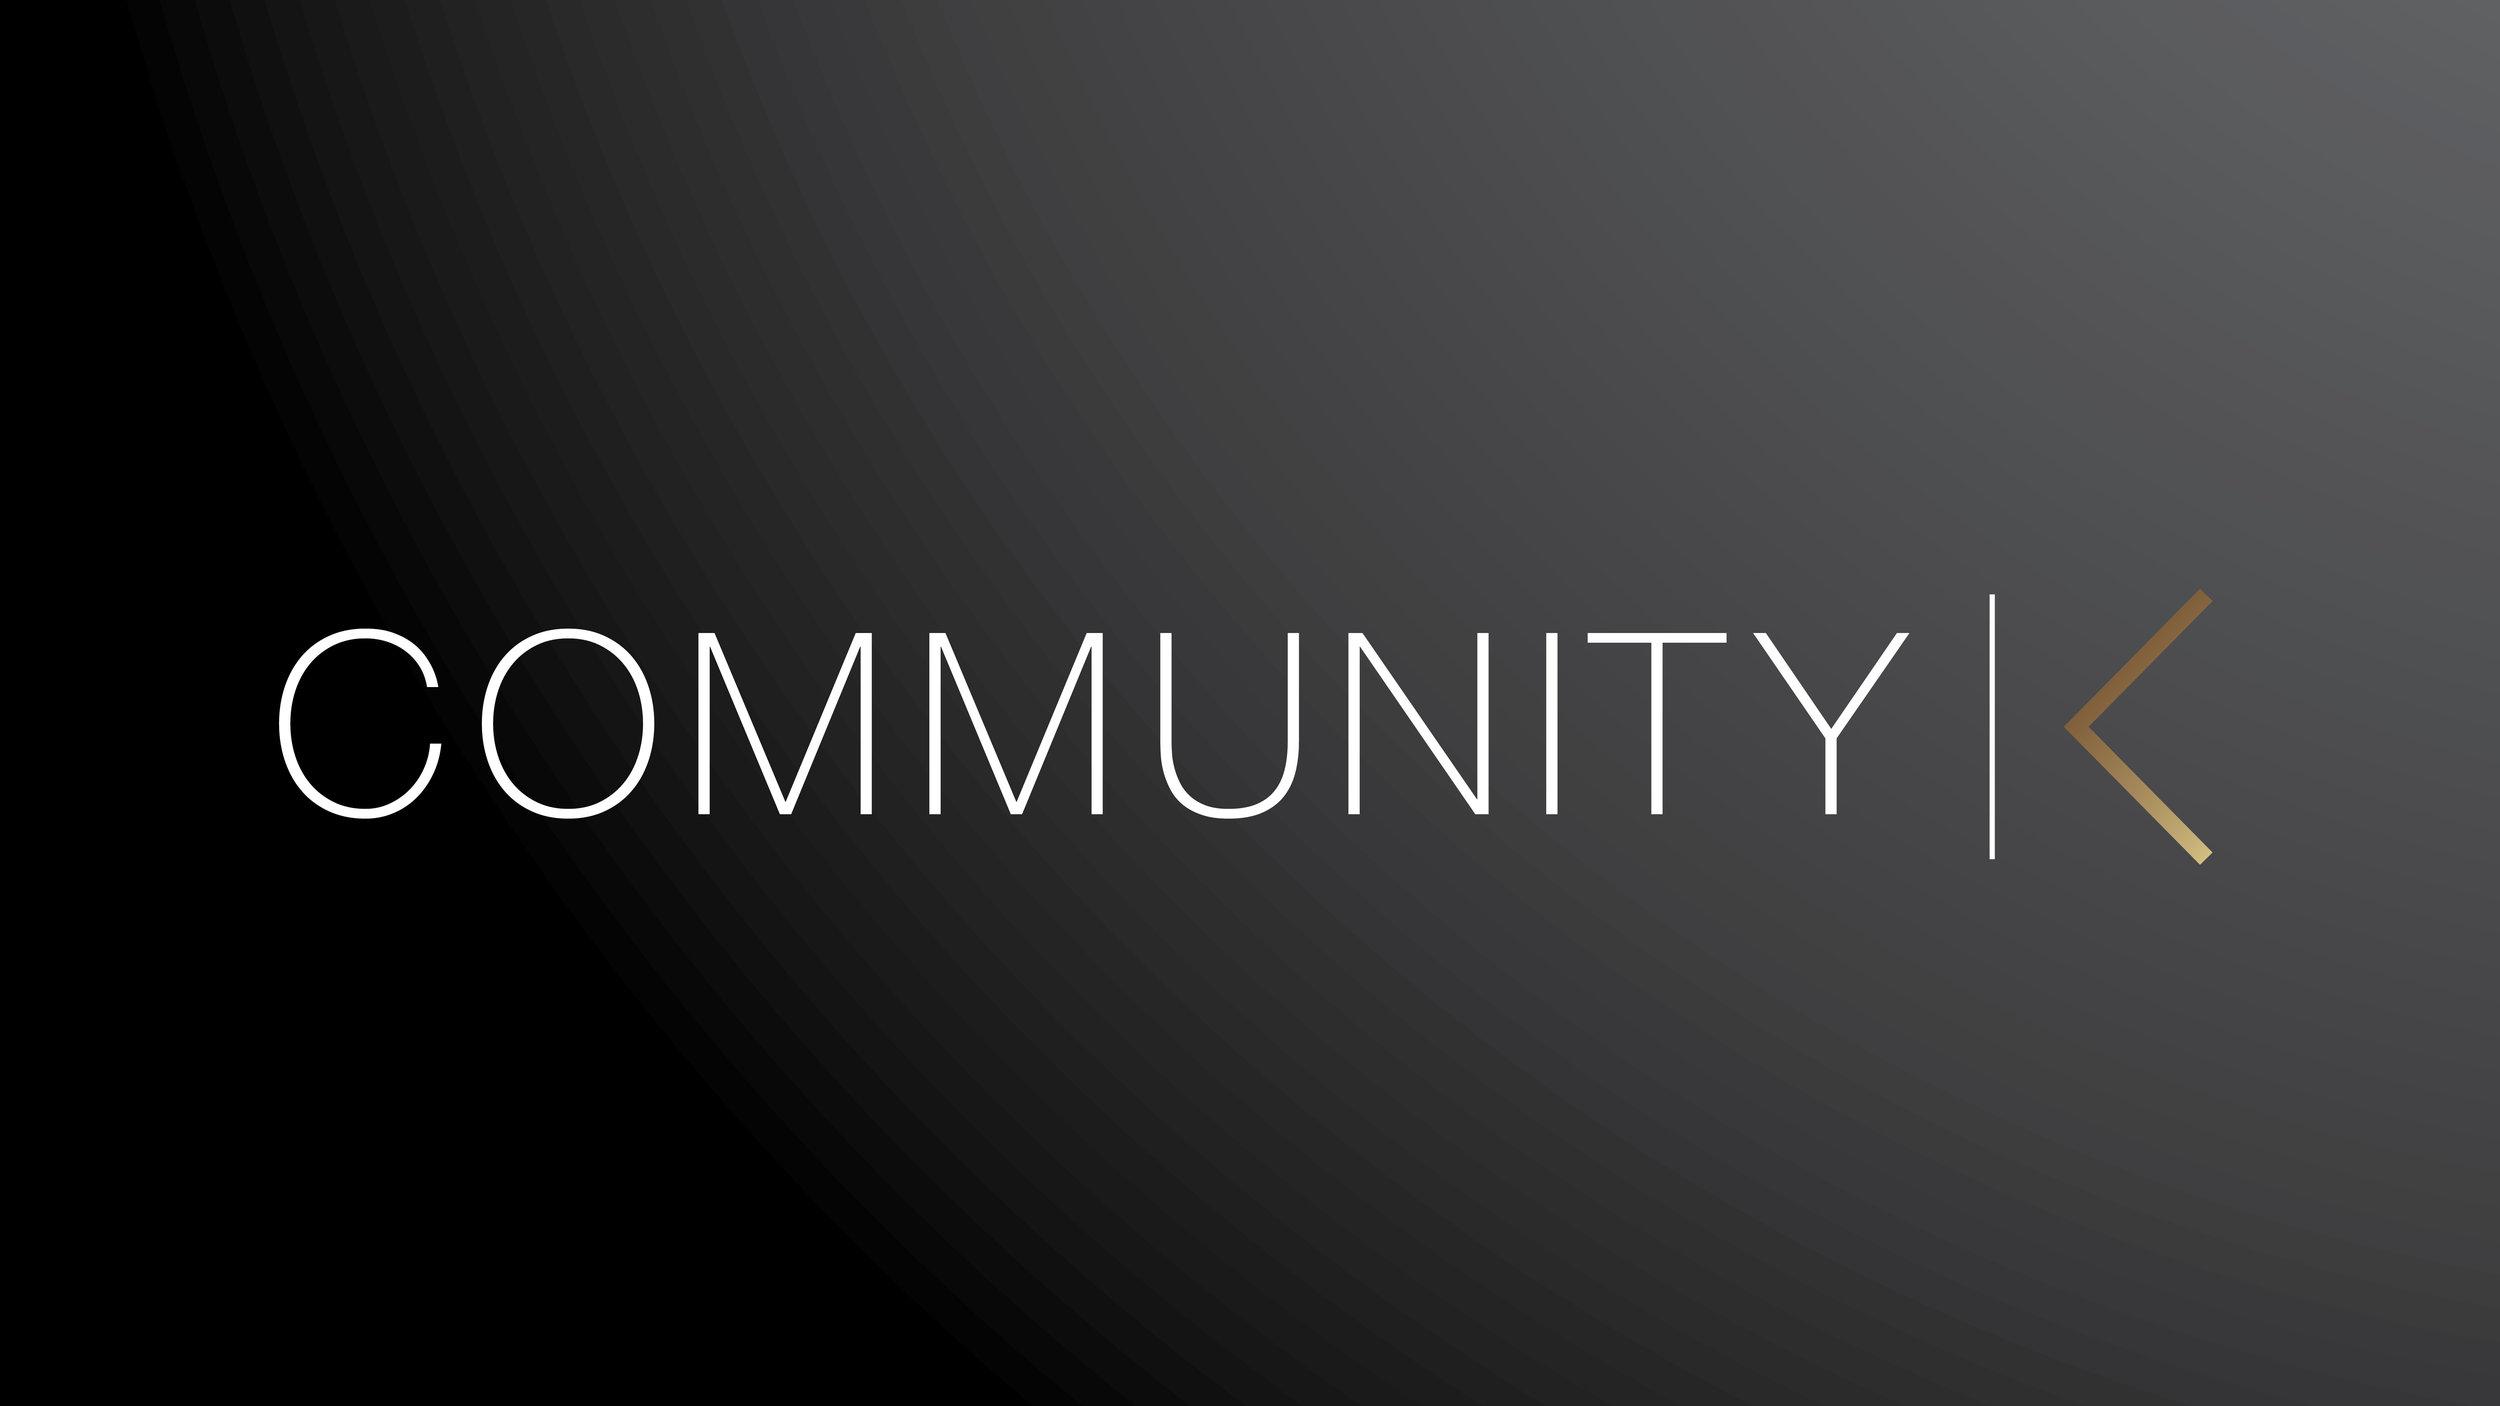 COMMUNITY.jpeg